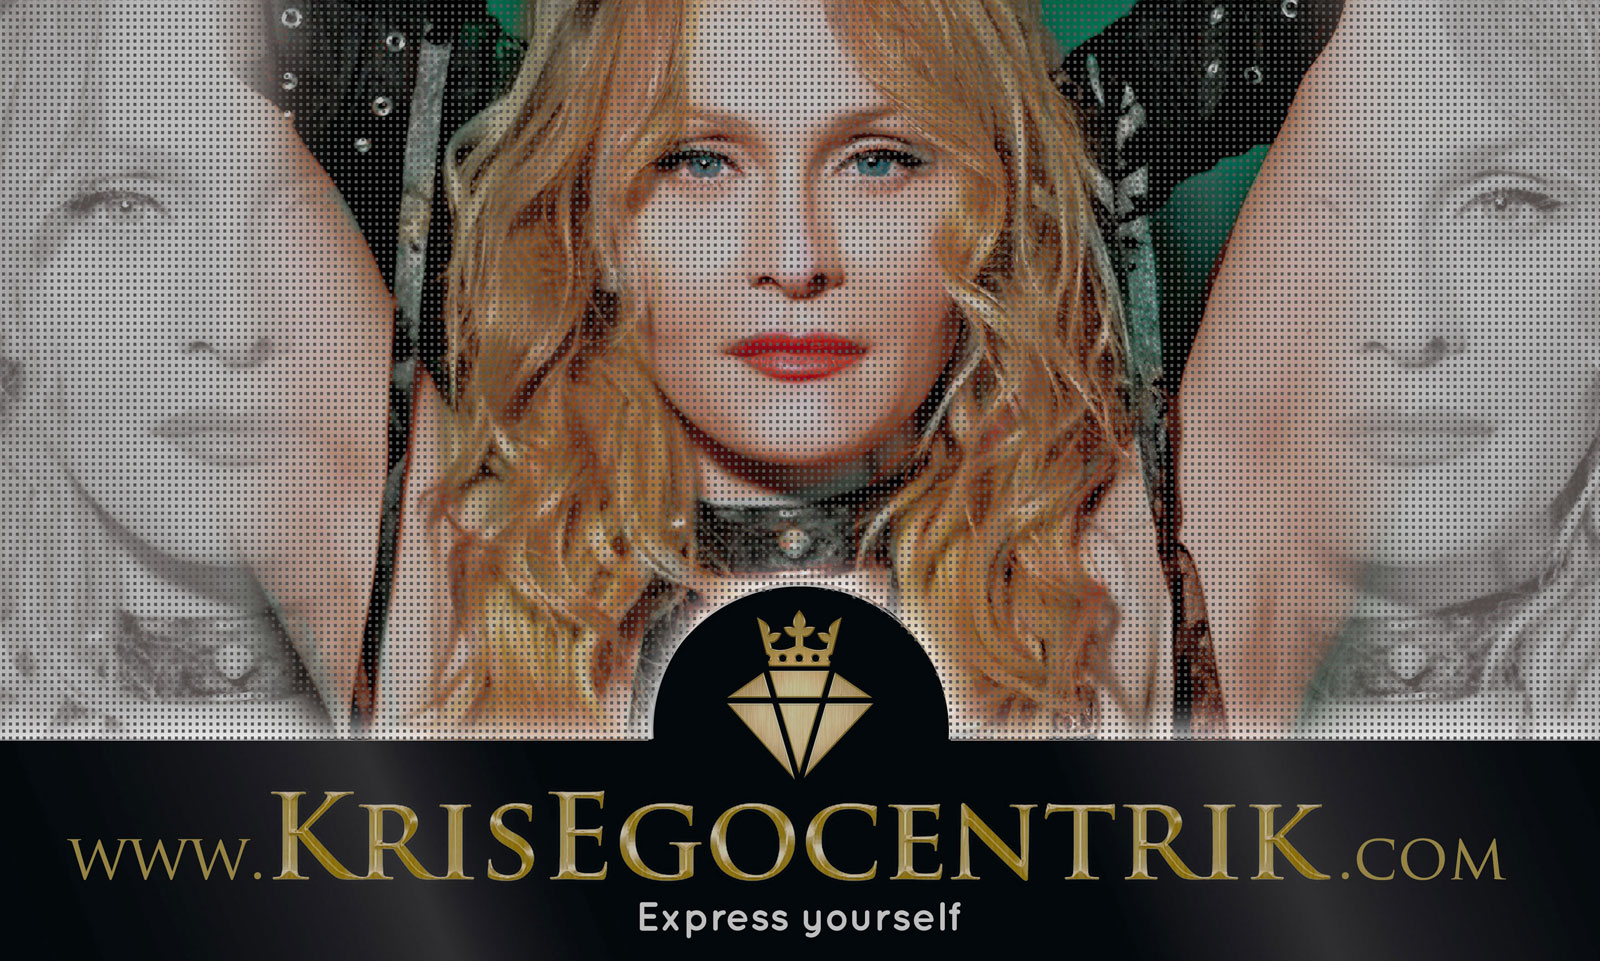 KrisEgocentrik